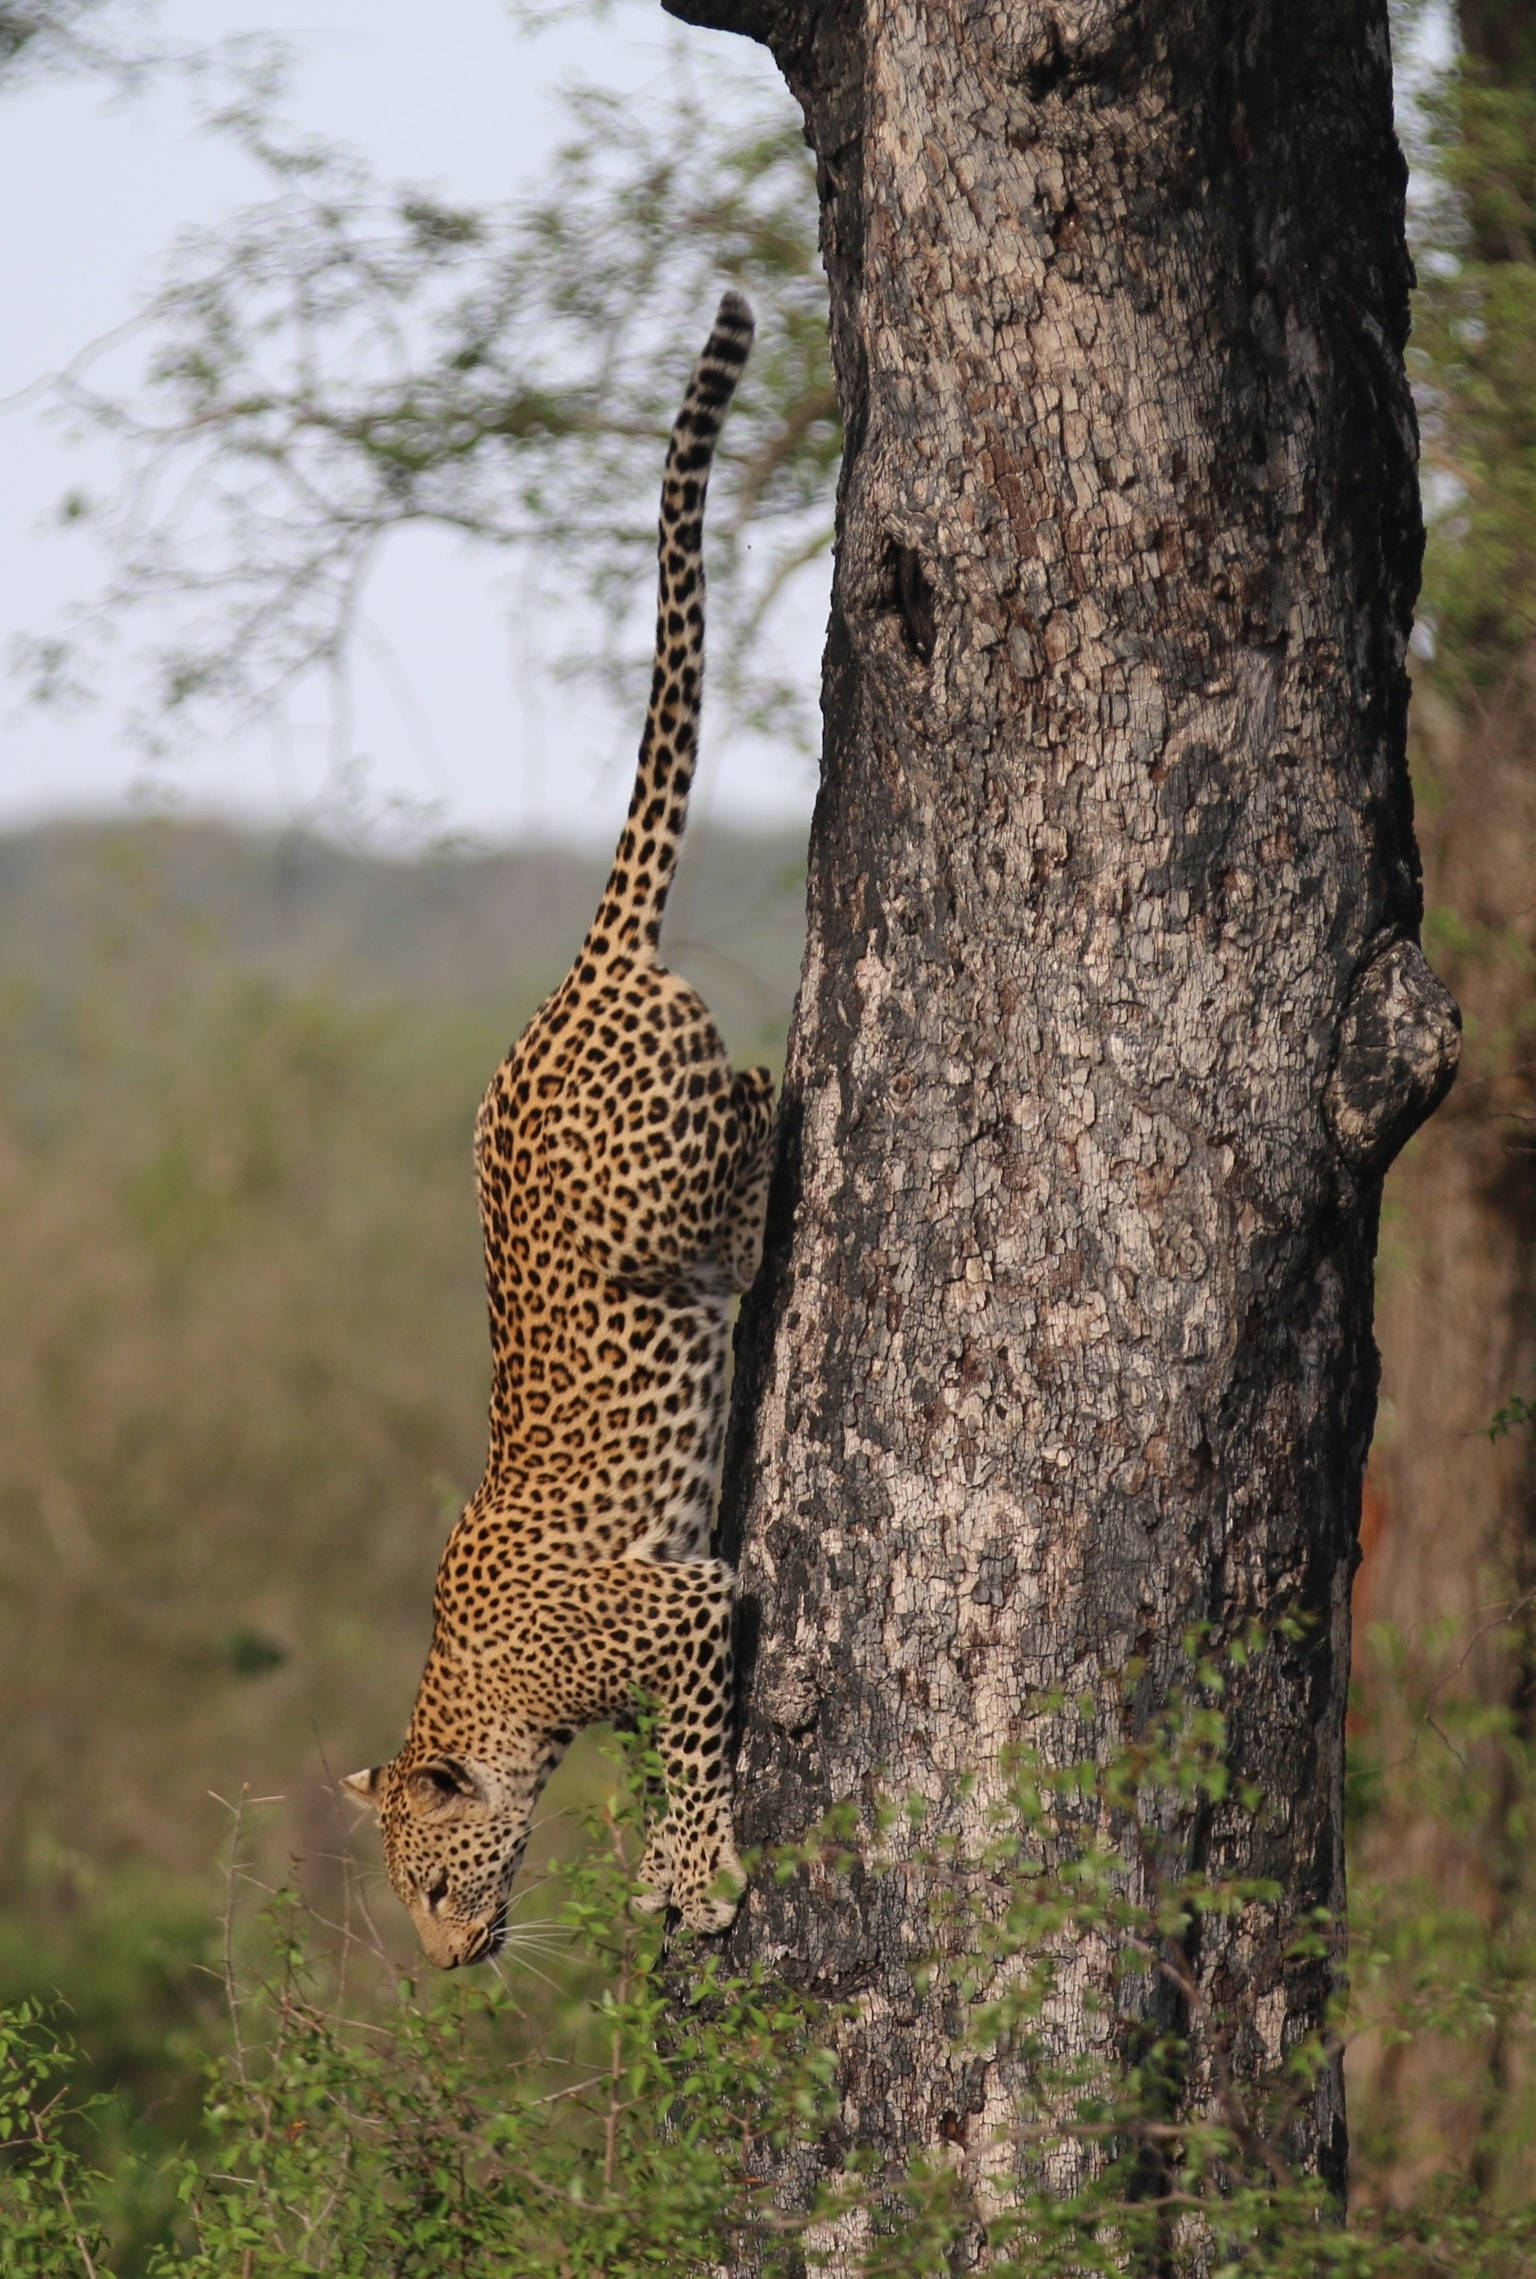 A leopard climbing down a tree